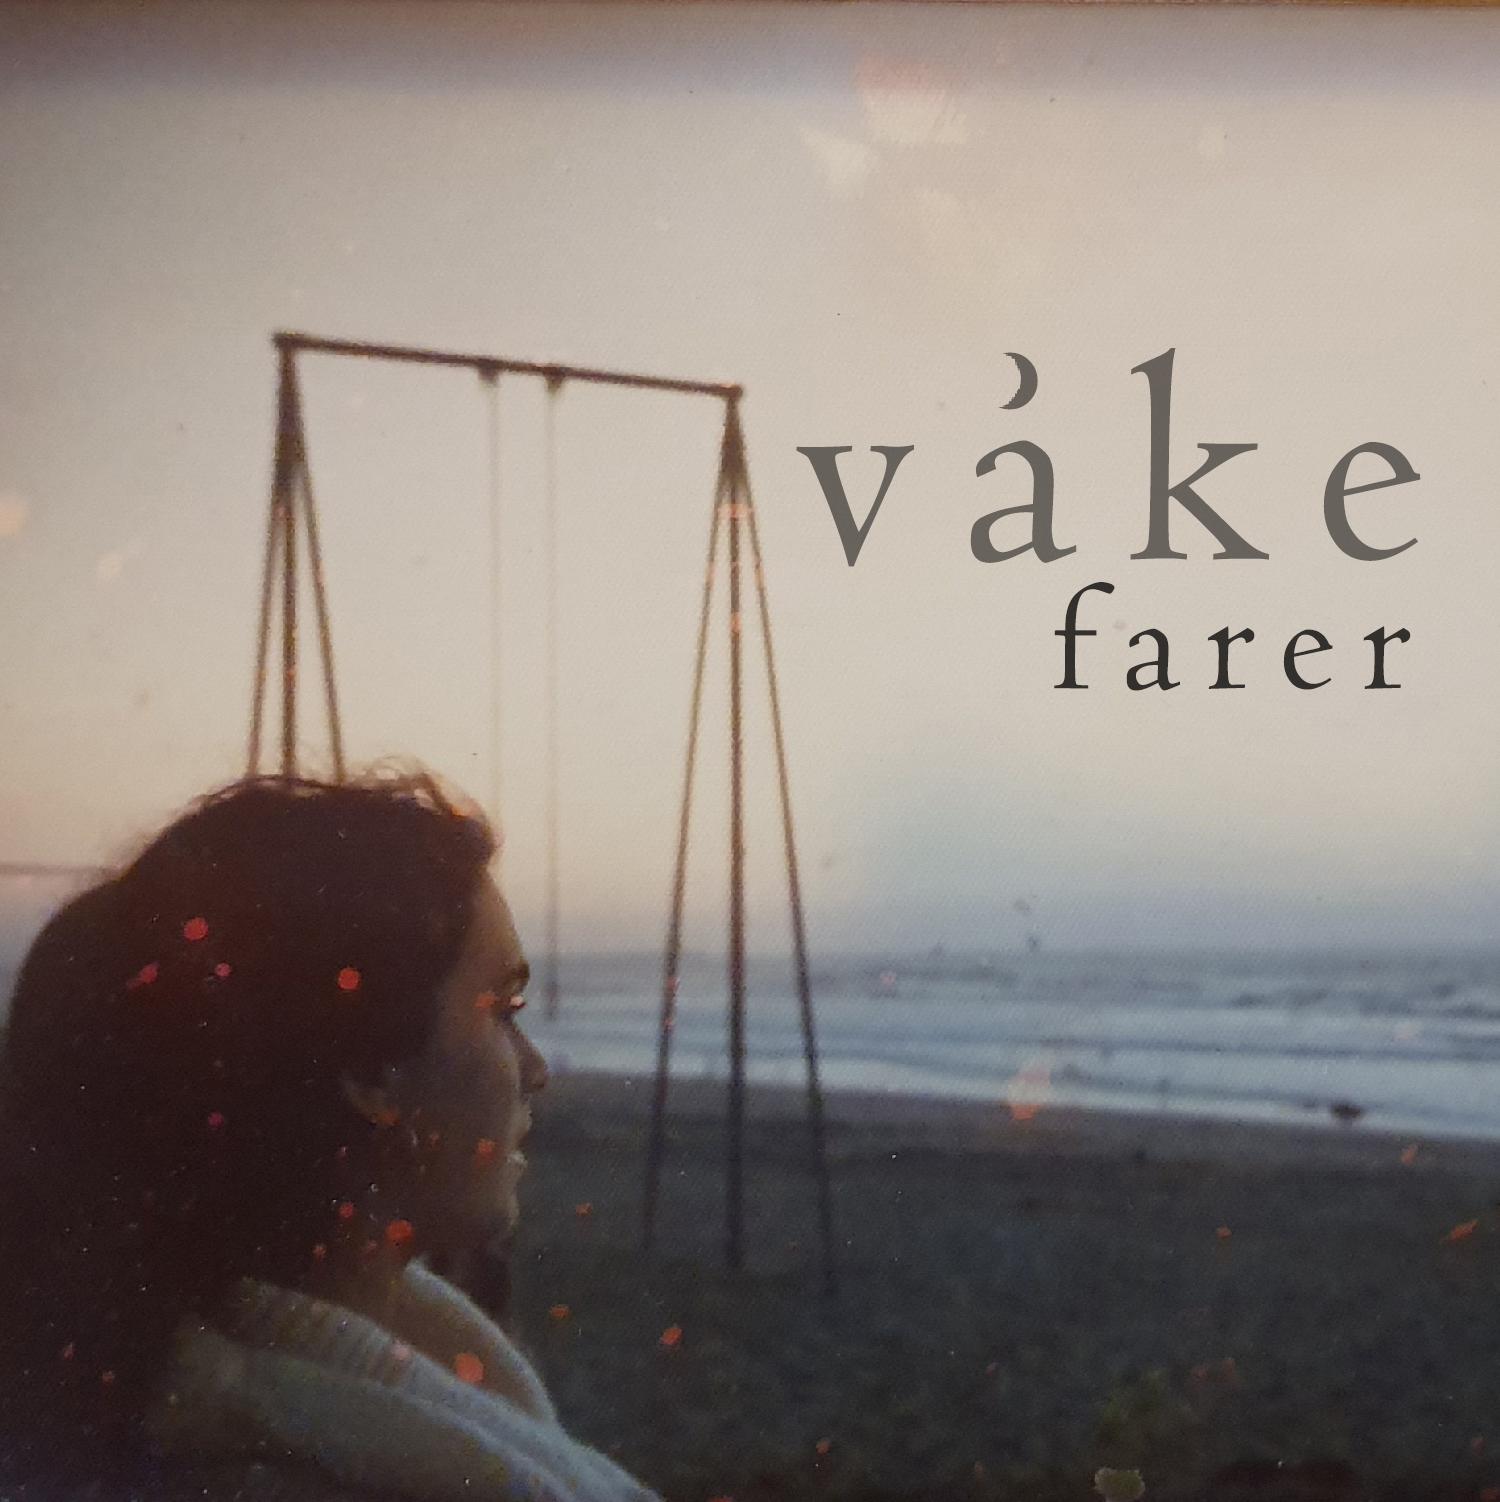 Farer Image